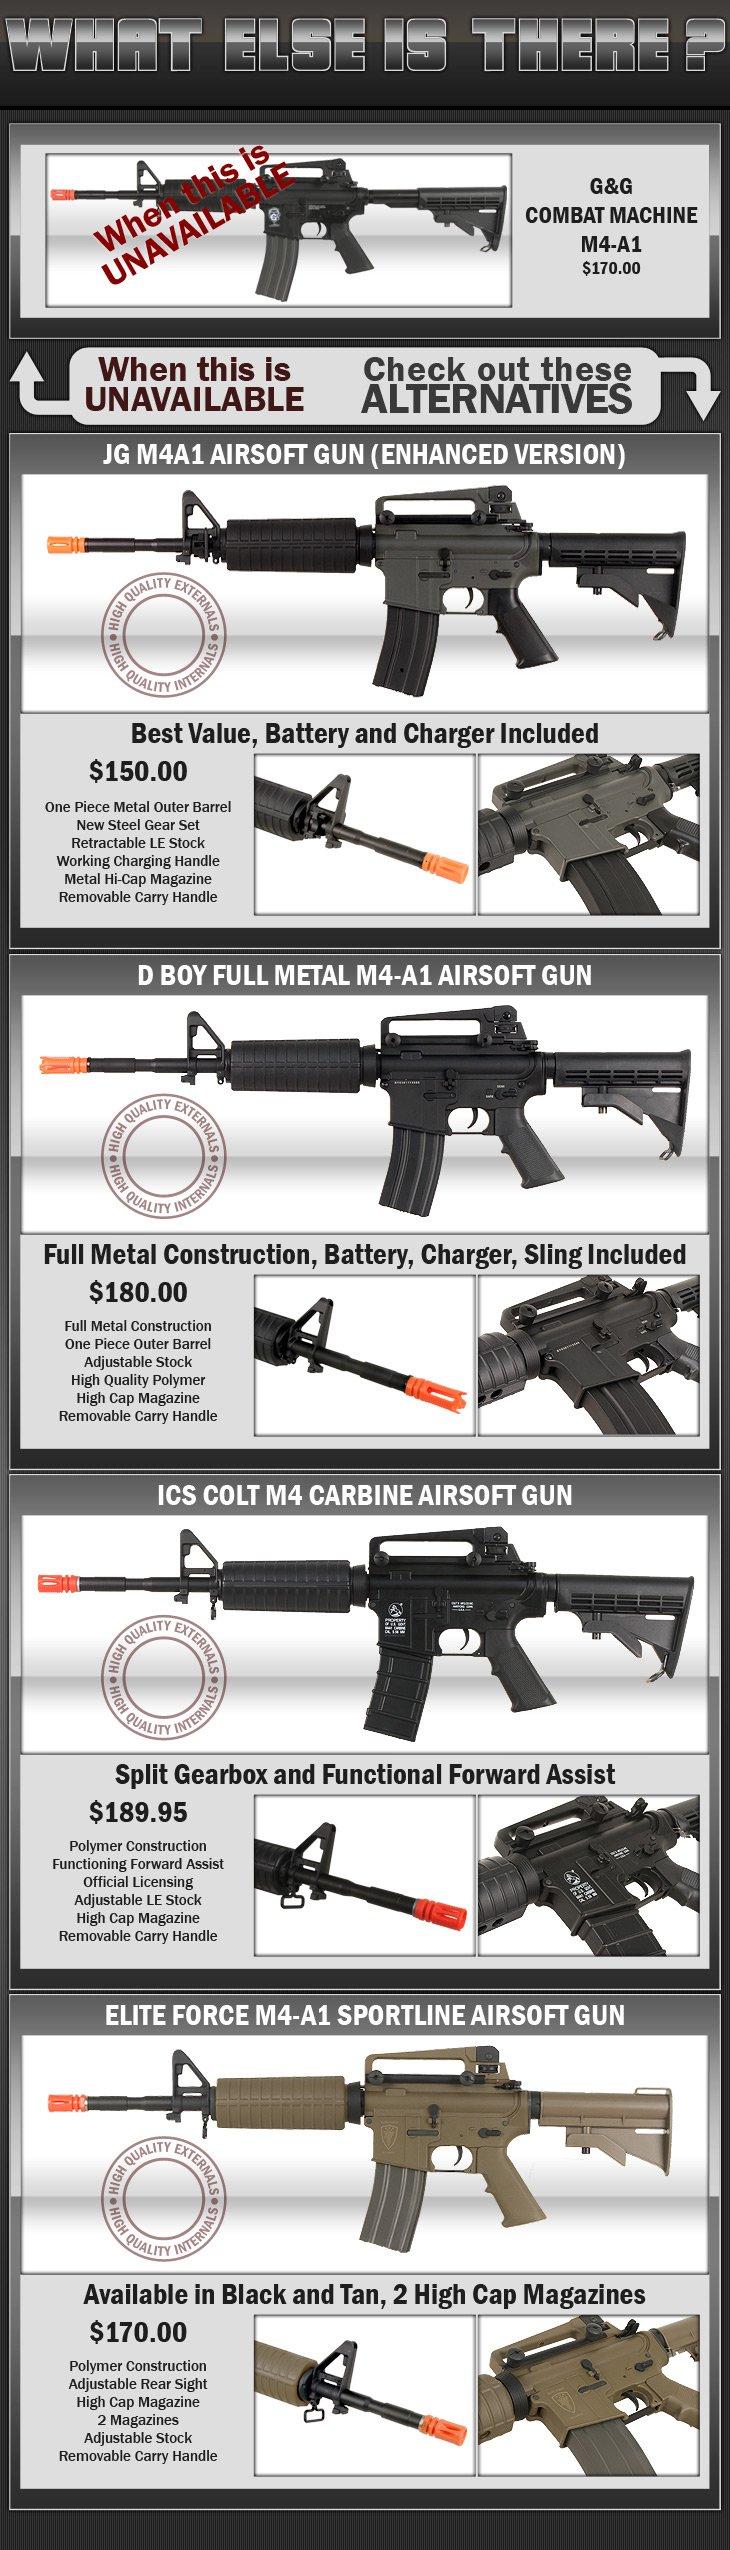 elite force sportline m4a1 carbine aeg airsoft gun black